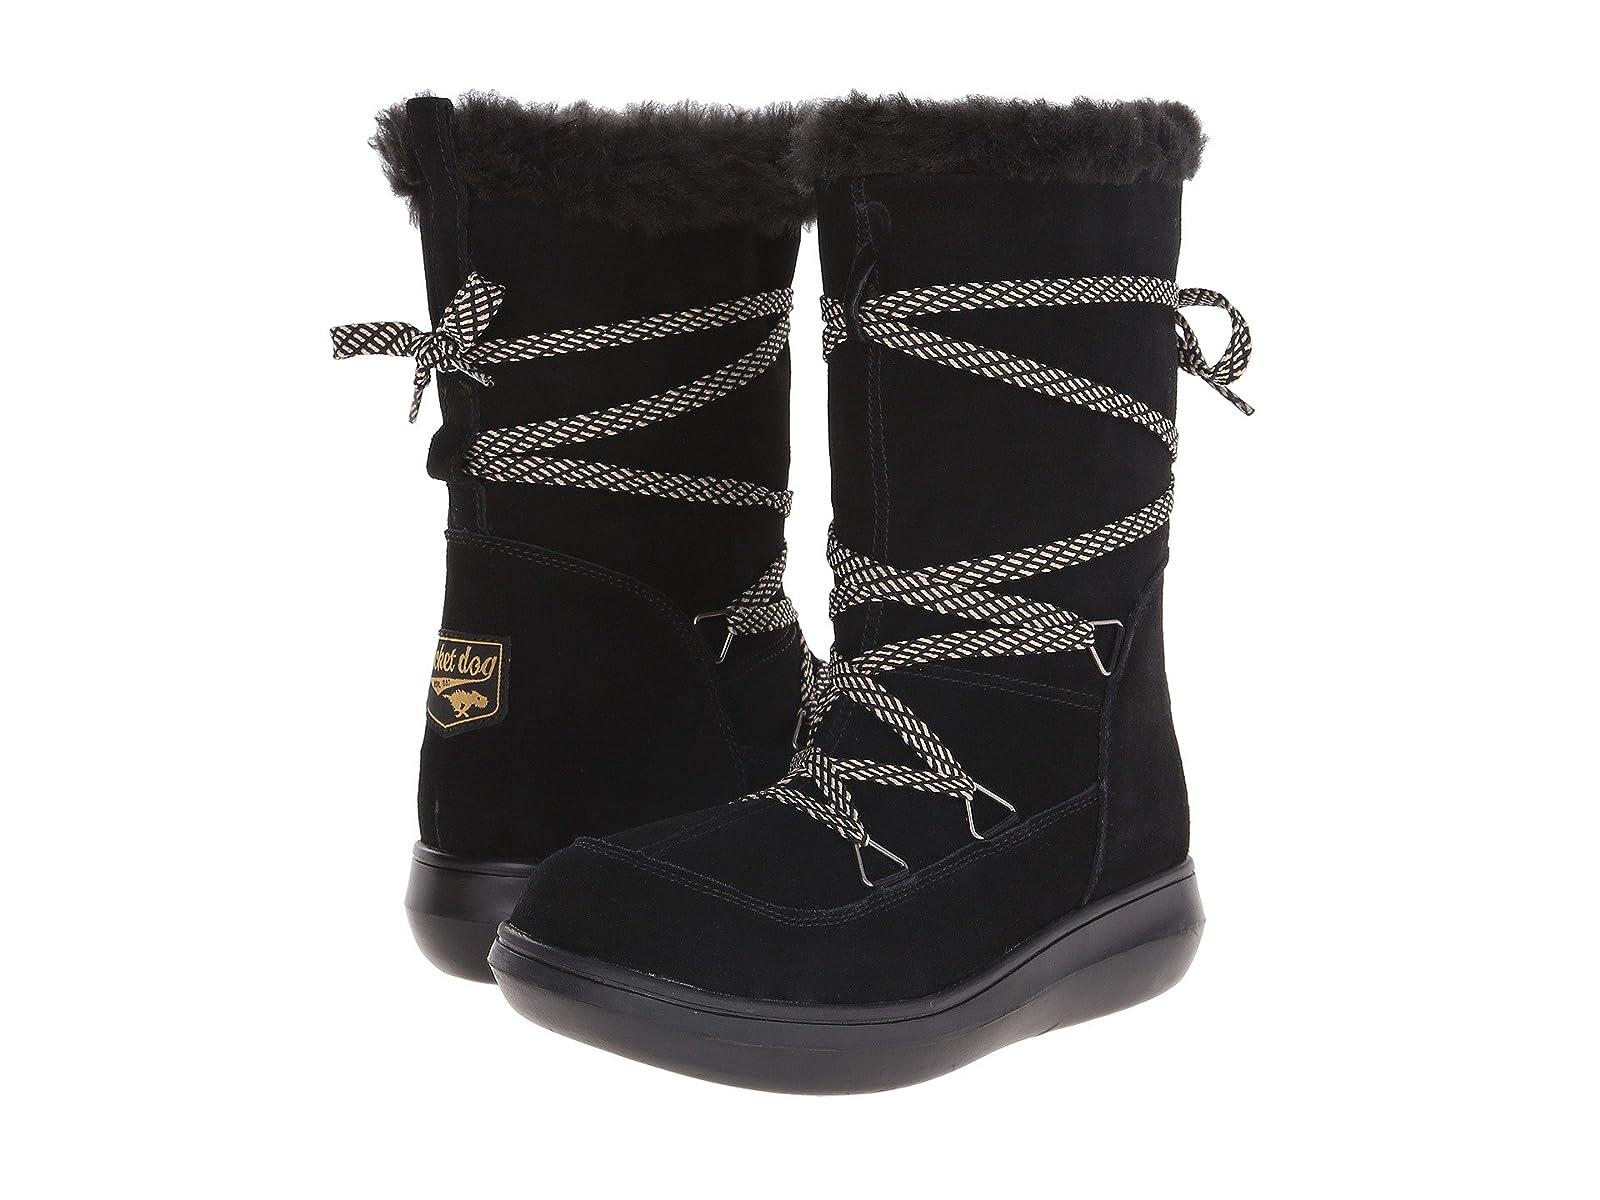 Rocket Dog SnowcrushCheap and distinctive eye-catching shoes